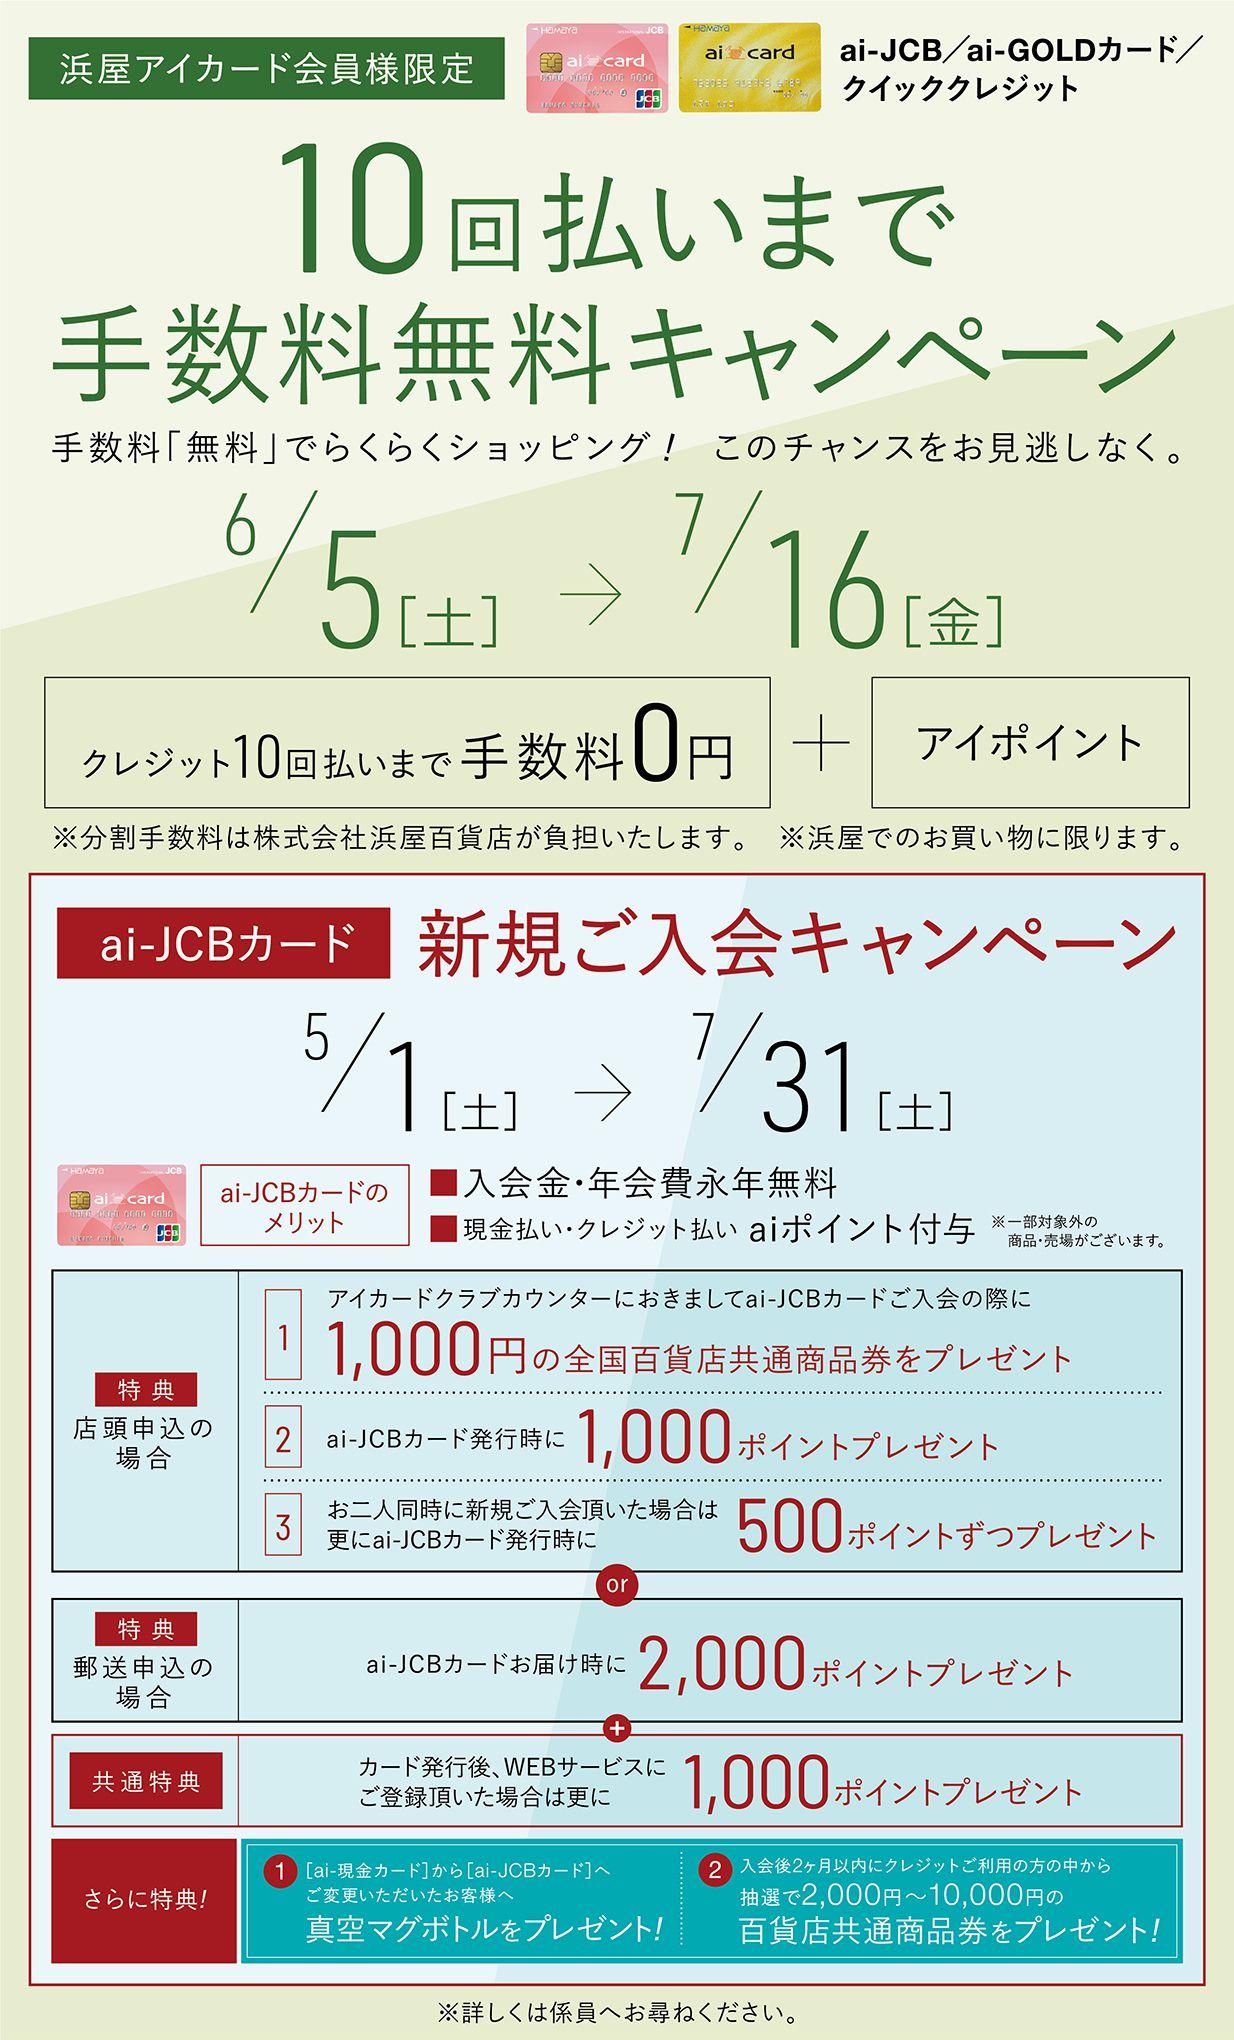 ai-JCBカード 10回払いまで手数料無料キャンペーン;